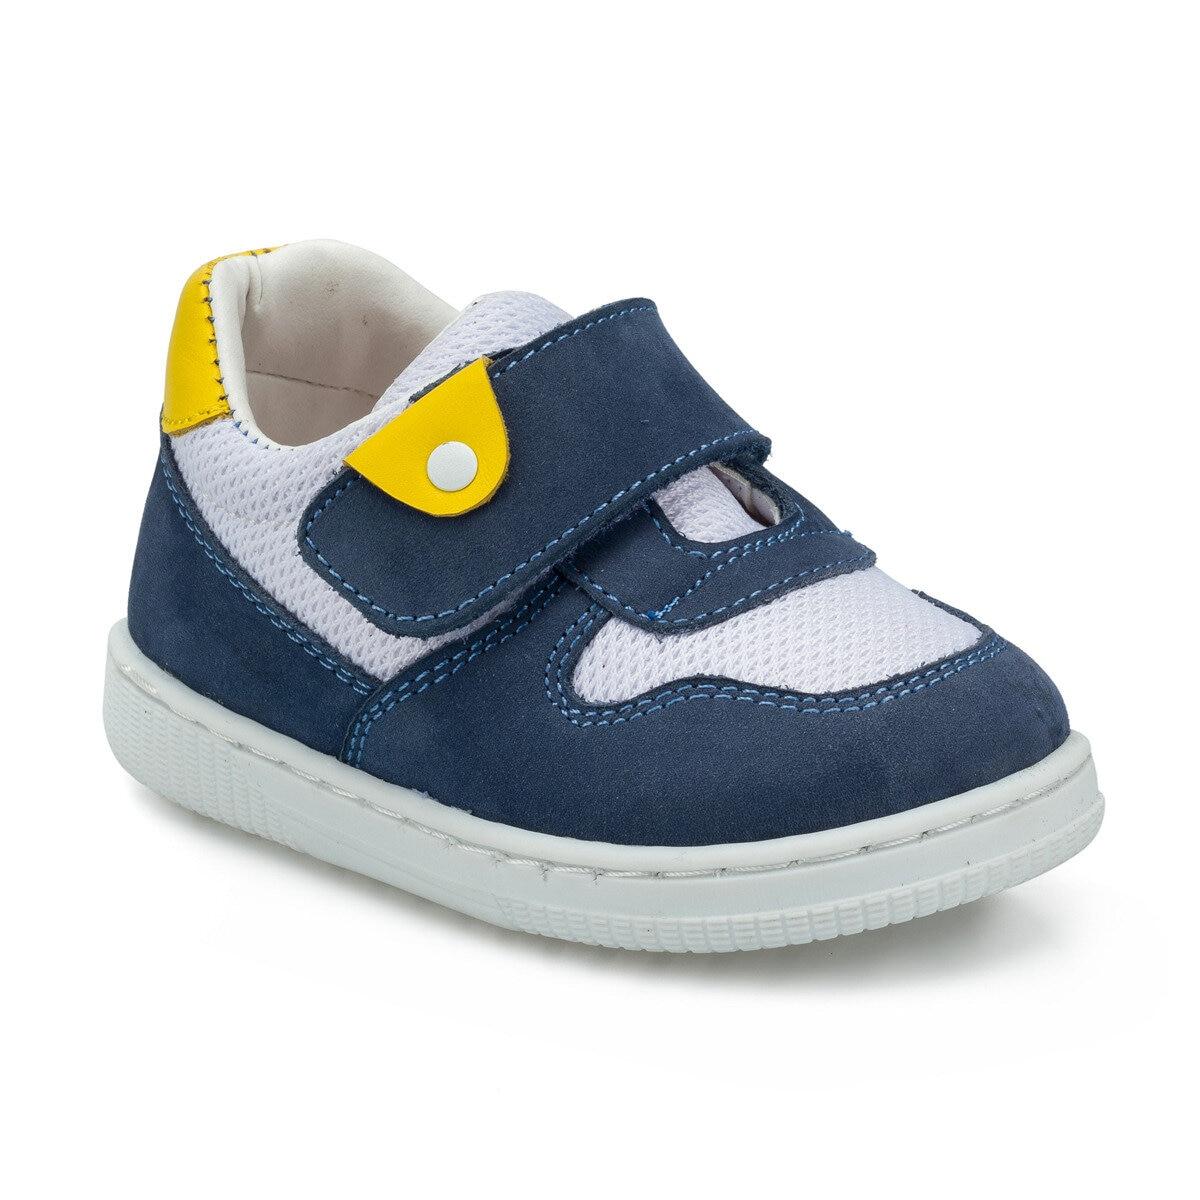 FLO 512211.I Navy Blue Male Child Sneaker Shoes Polaris